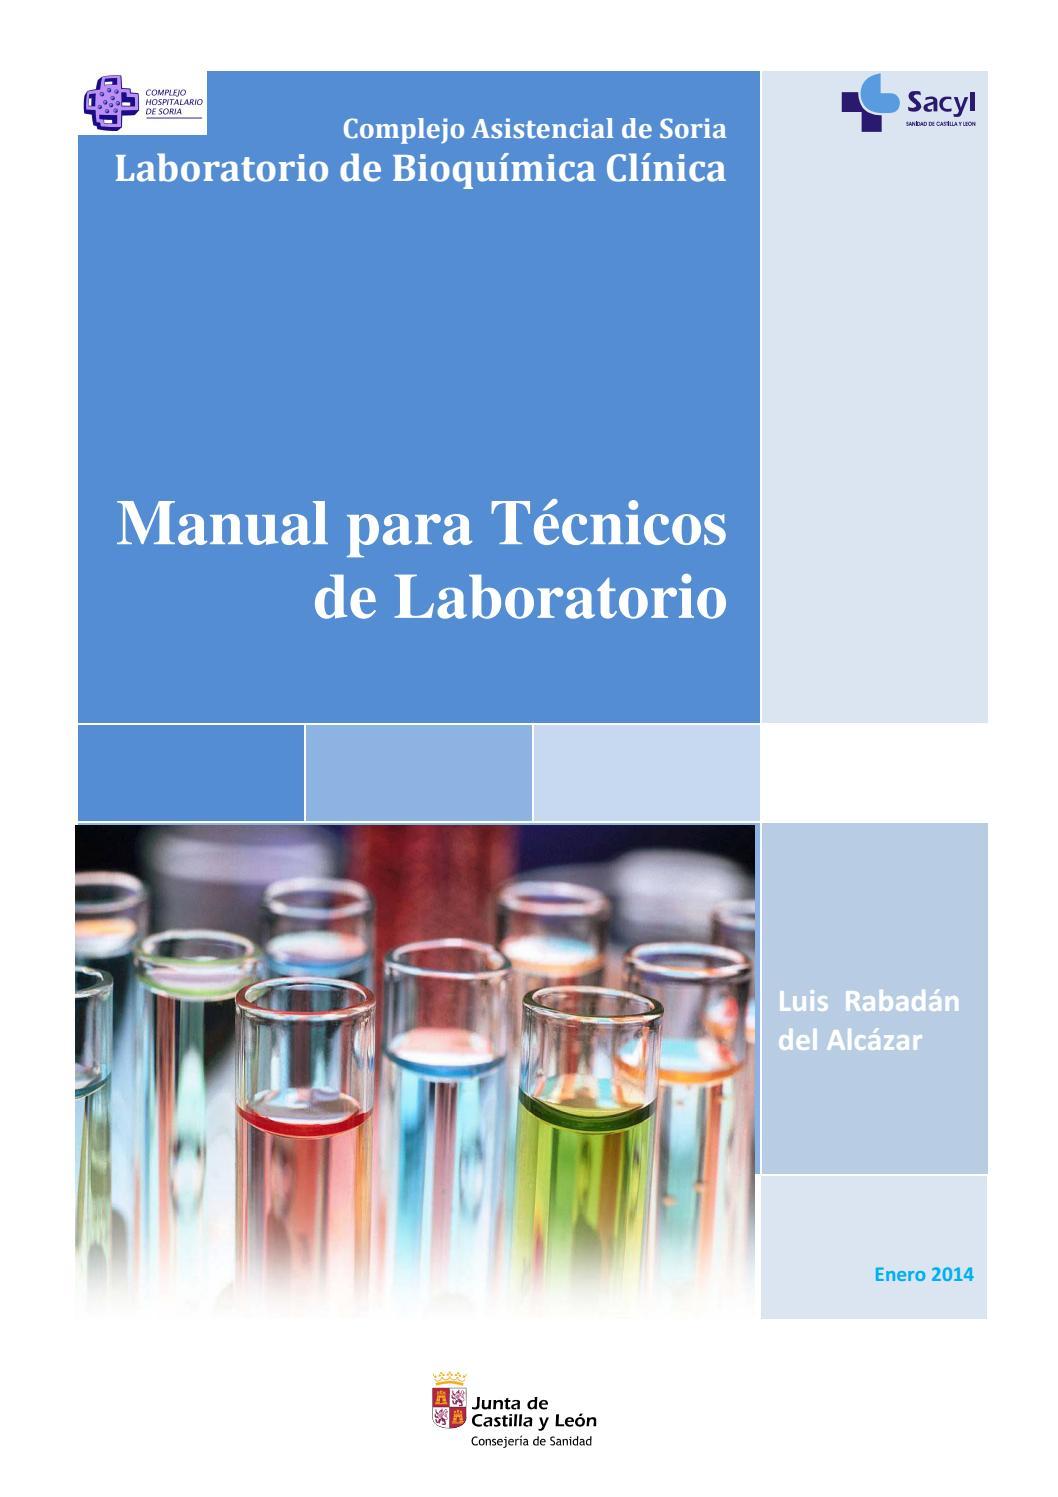 manual técnicos laboratorio by glpalo - issuu